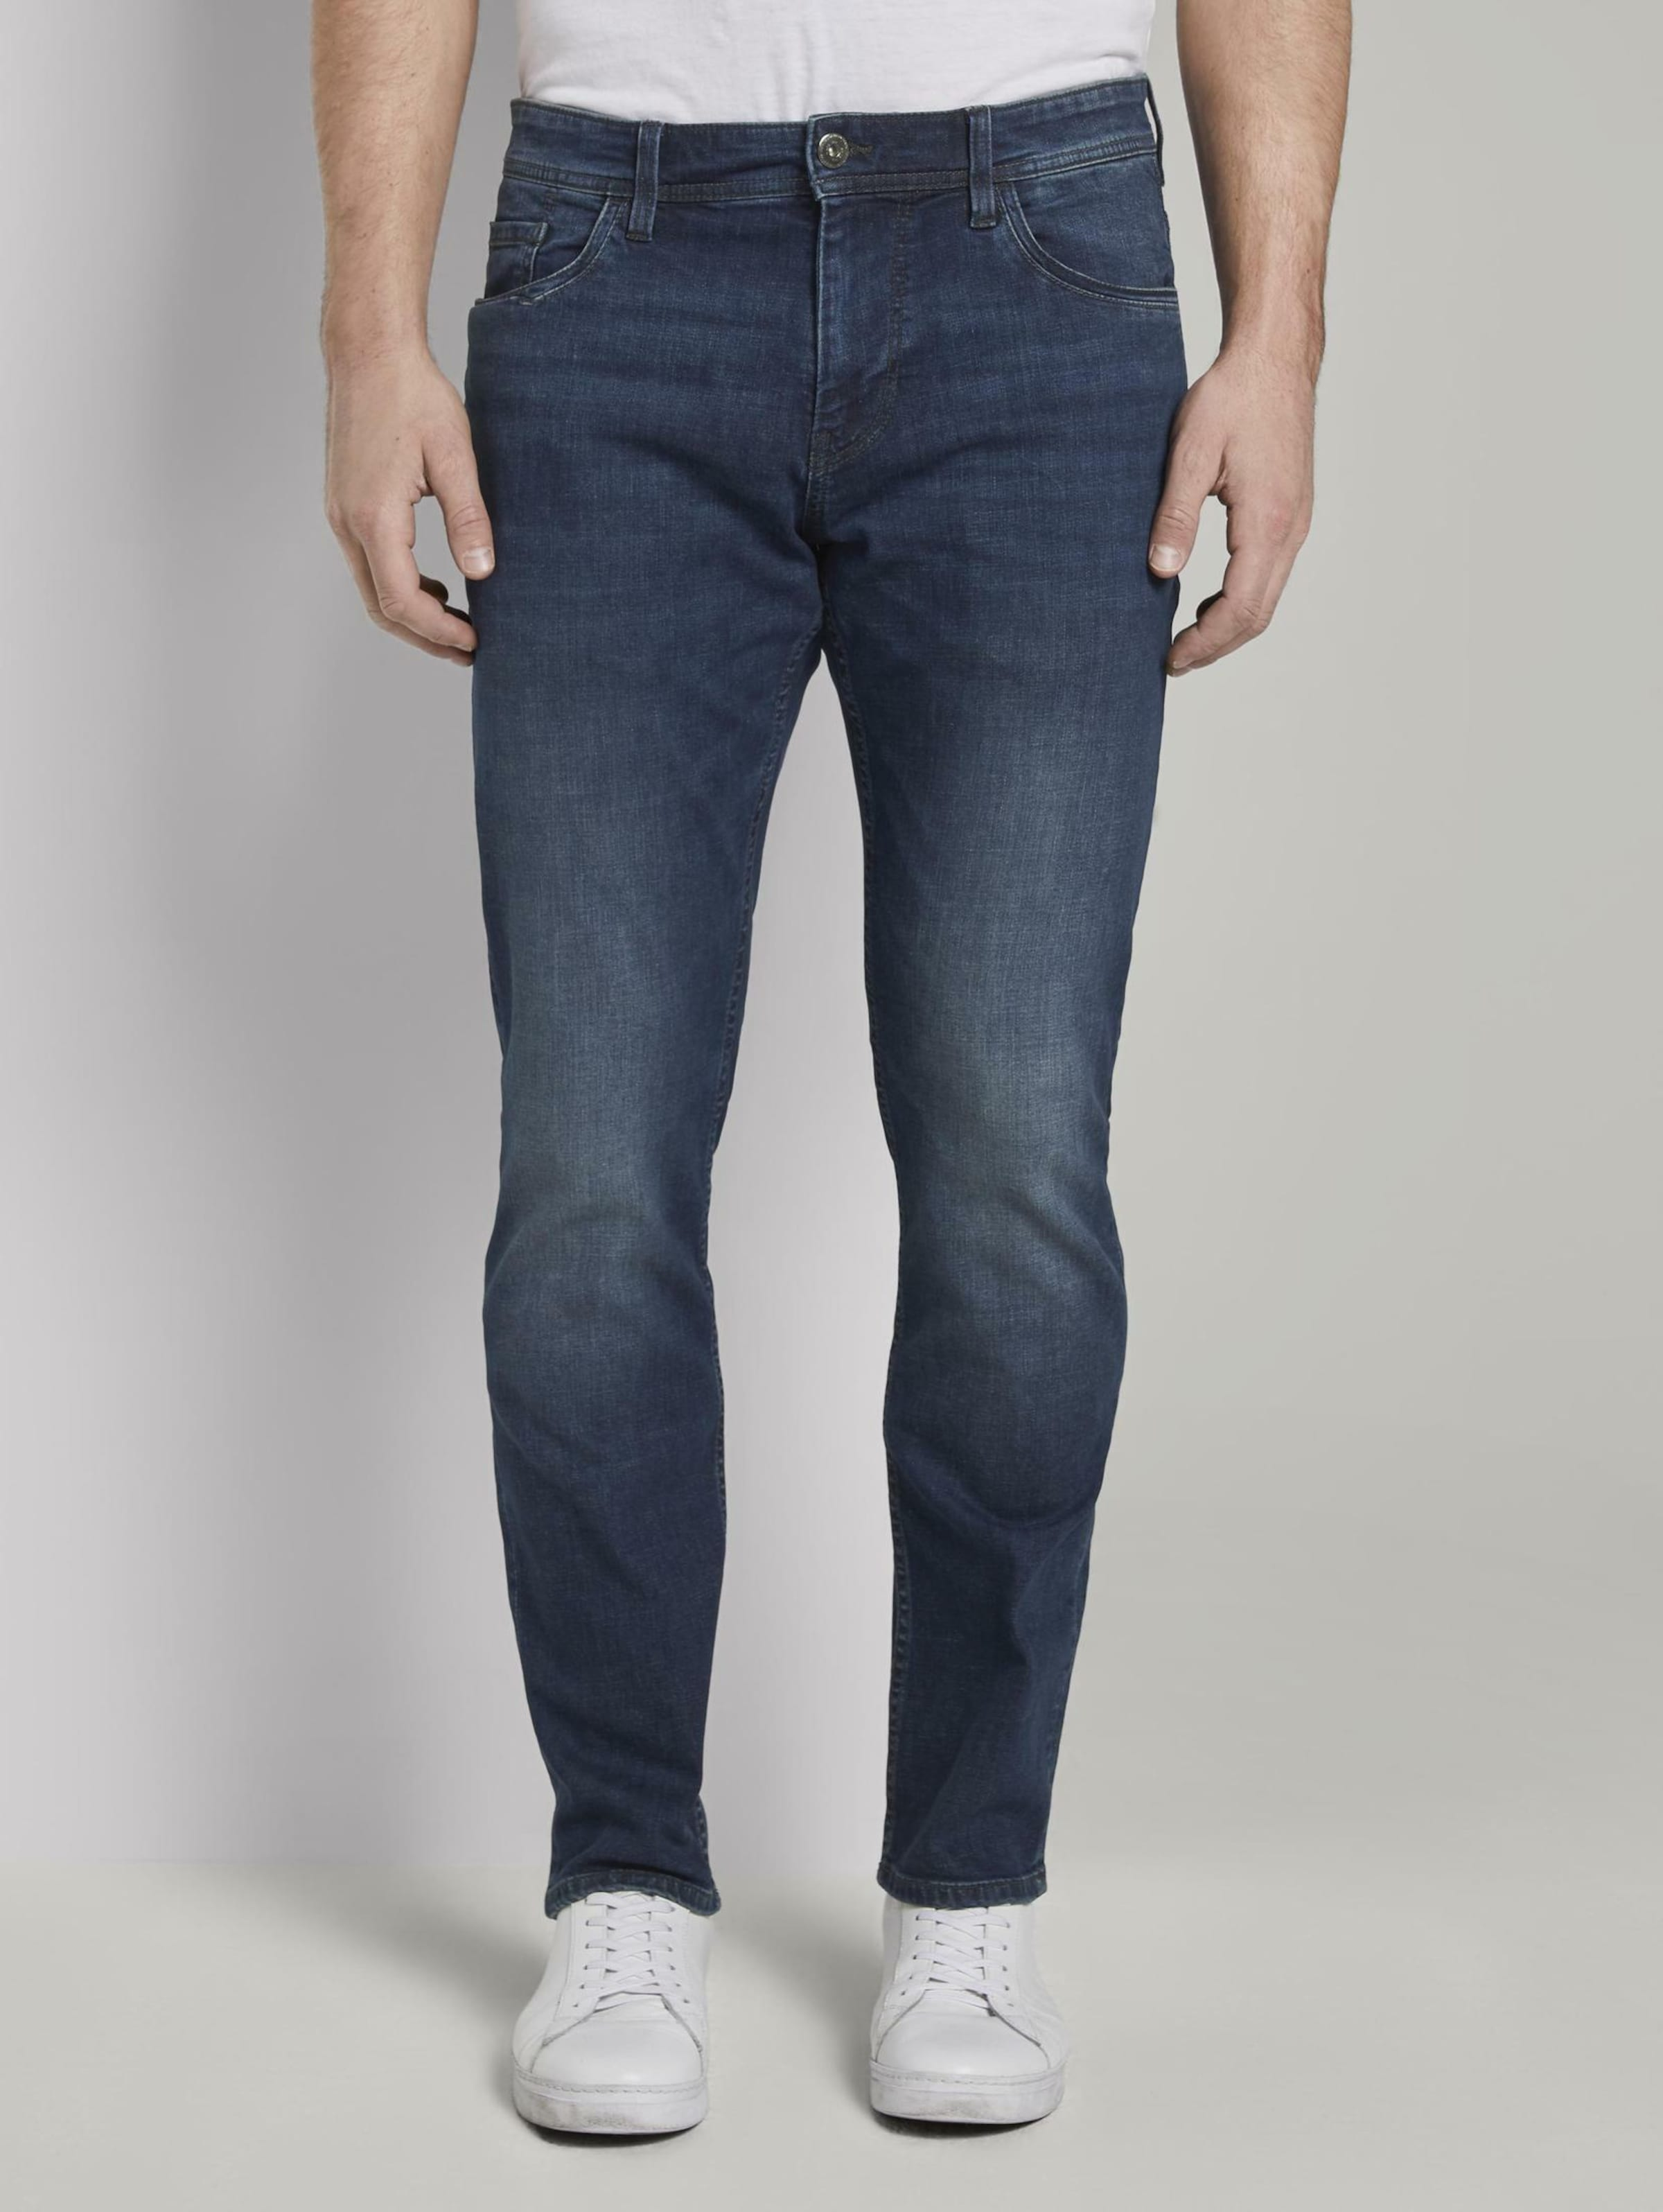 TOM TAILOR Jeanshosen Josh Regular Slim Jeans in blau Unifarben 1017302036